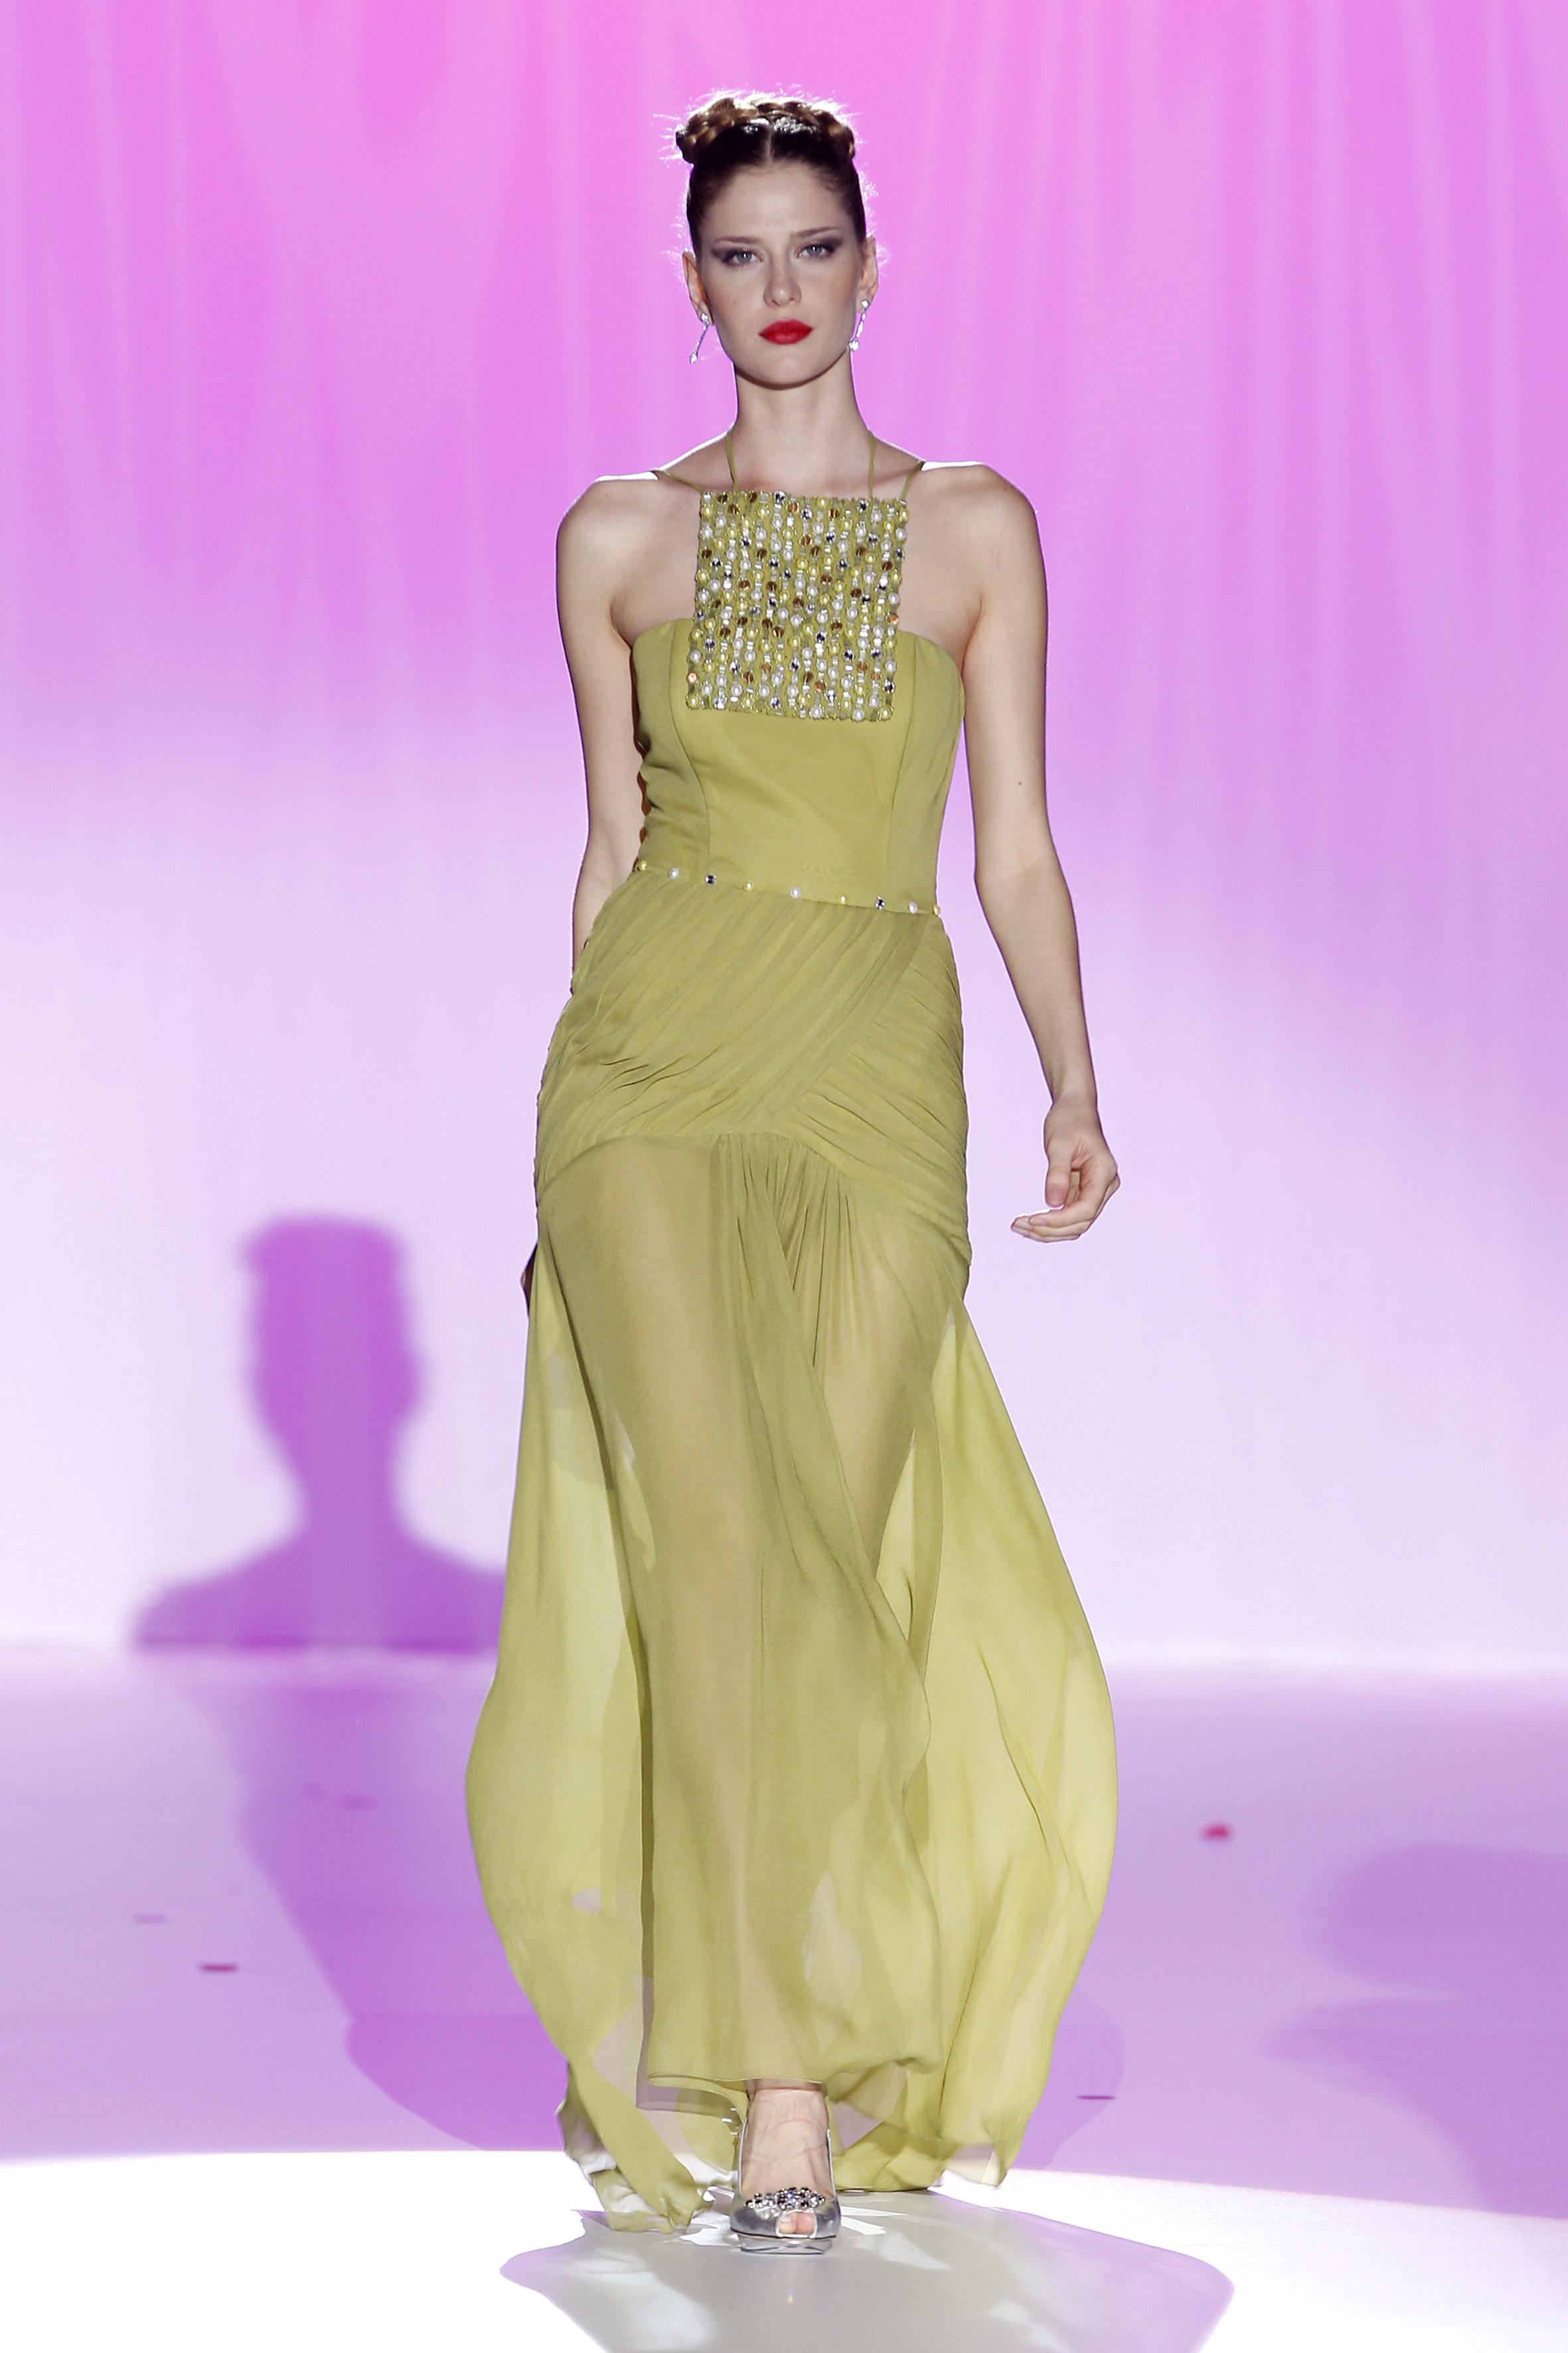 Bonito Vestidos De Novia 2012 Modelo - Colección de Vestidos de Boda ...